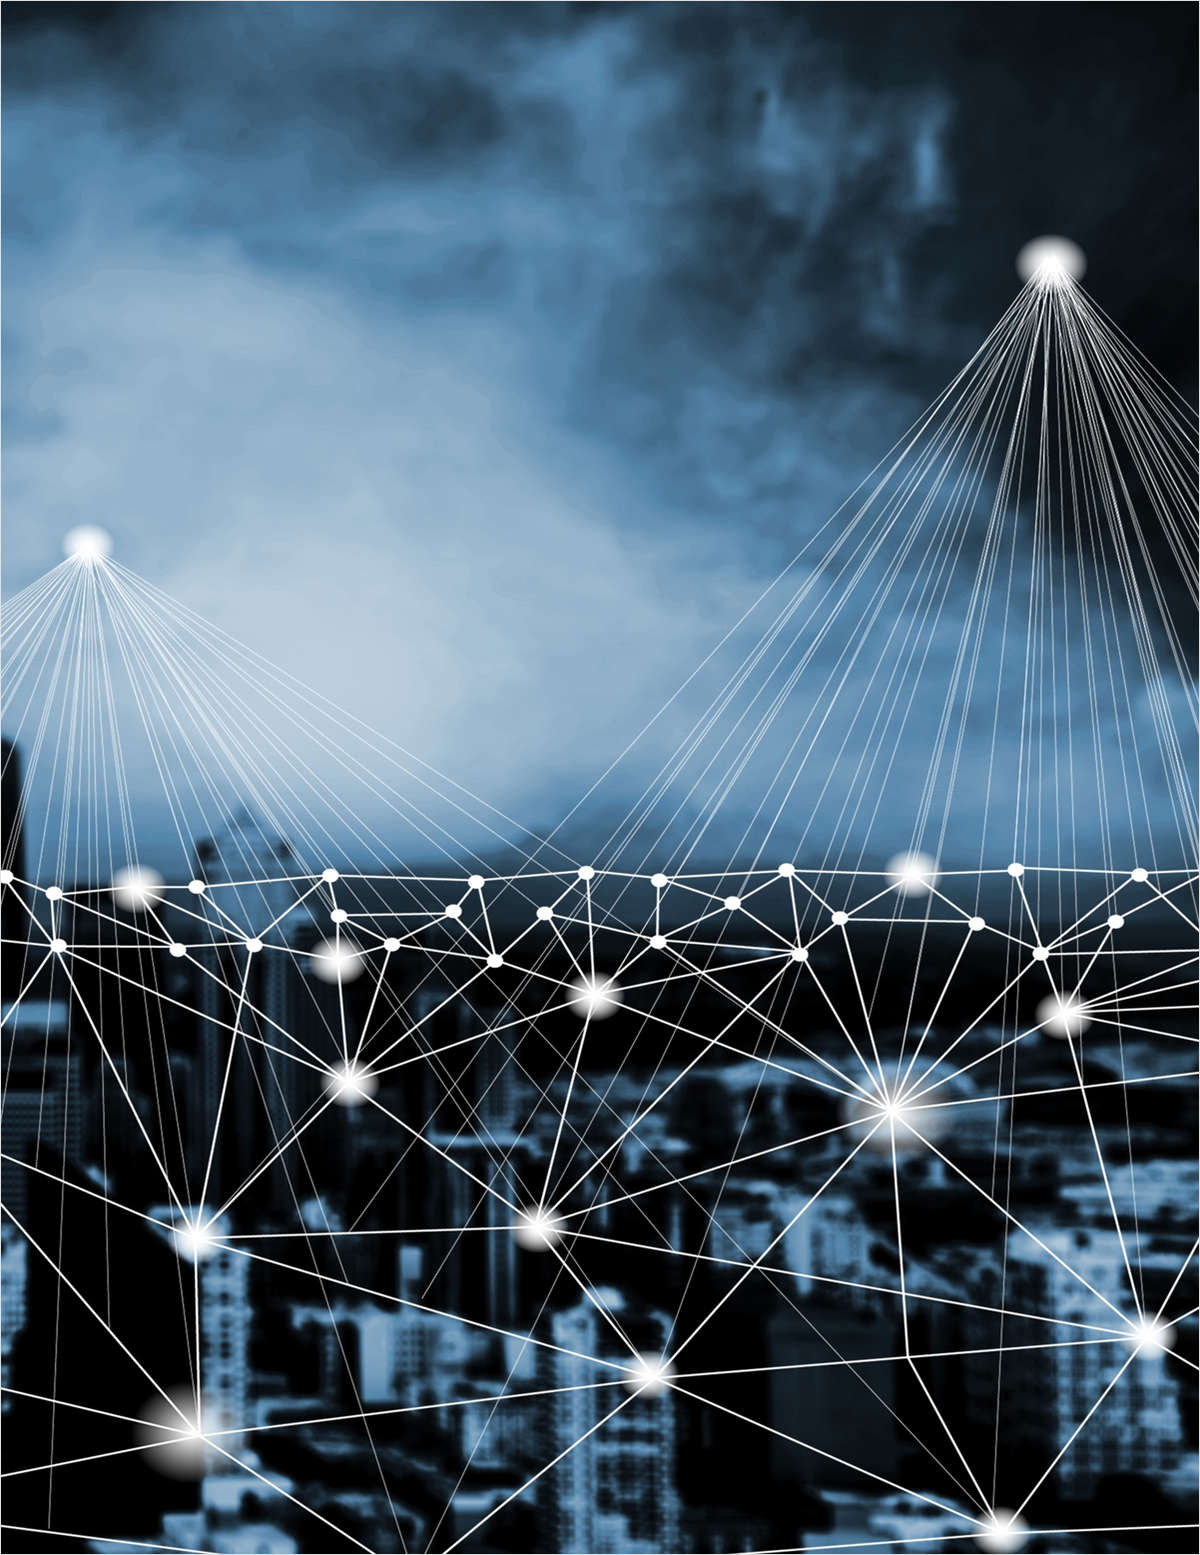 Event Stream Processing for Edge Computing